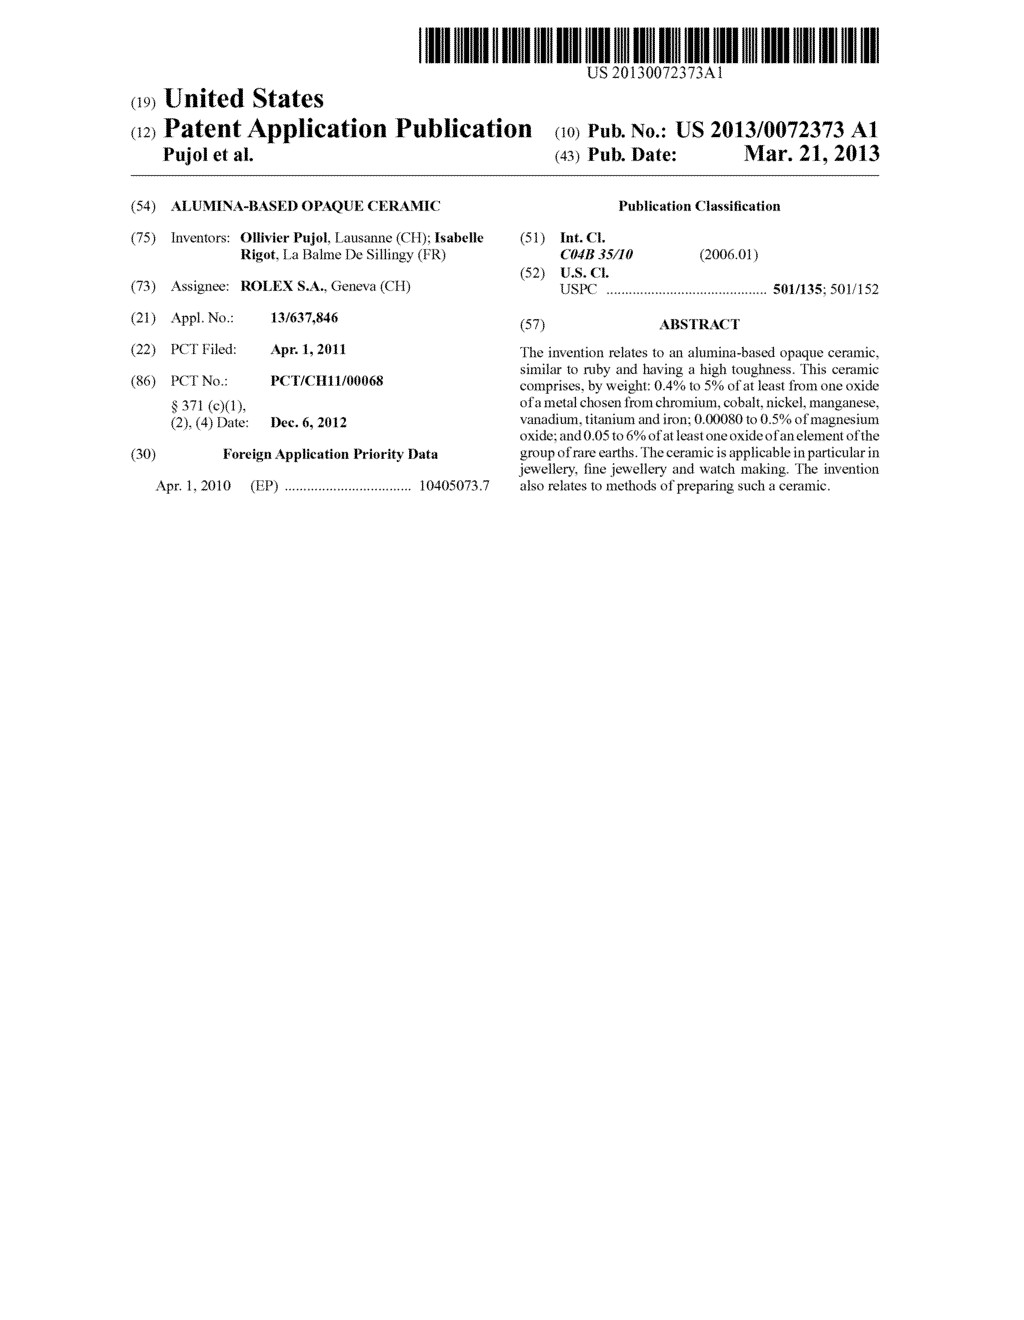 rolex-patent-13.jpg